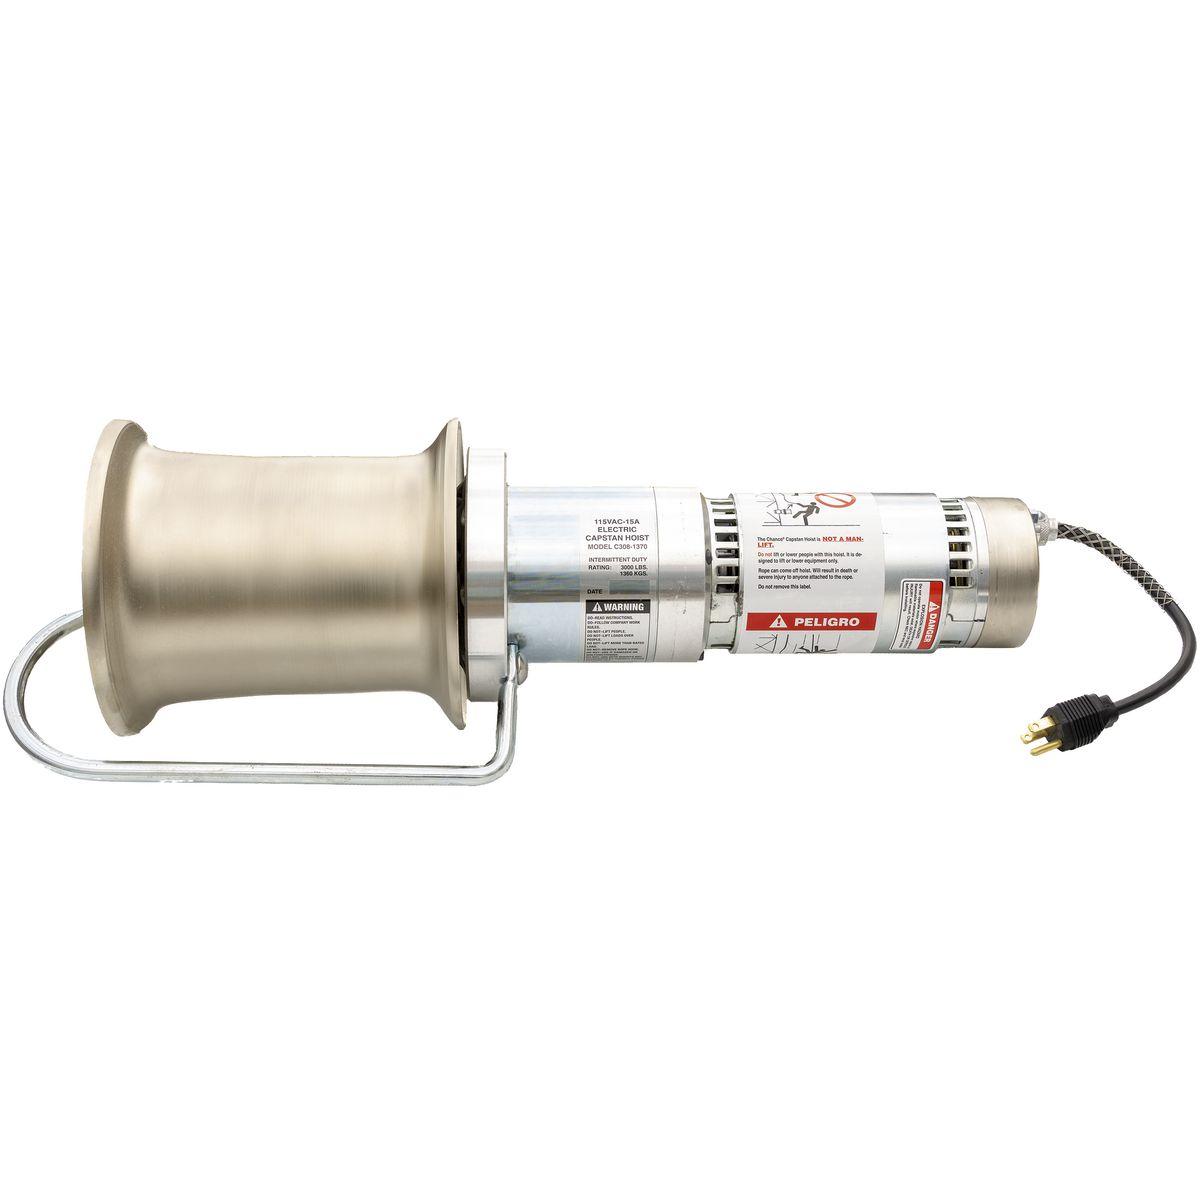 Capstan Hoist 3000 Lb 115 V Brand Hubbell Power Systems Ac 120 Volt Winch Wiring Diagram